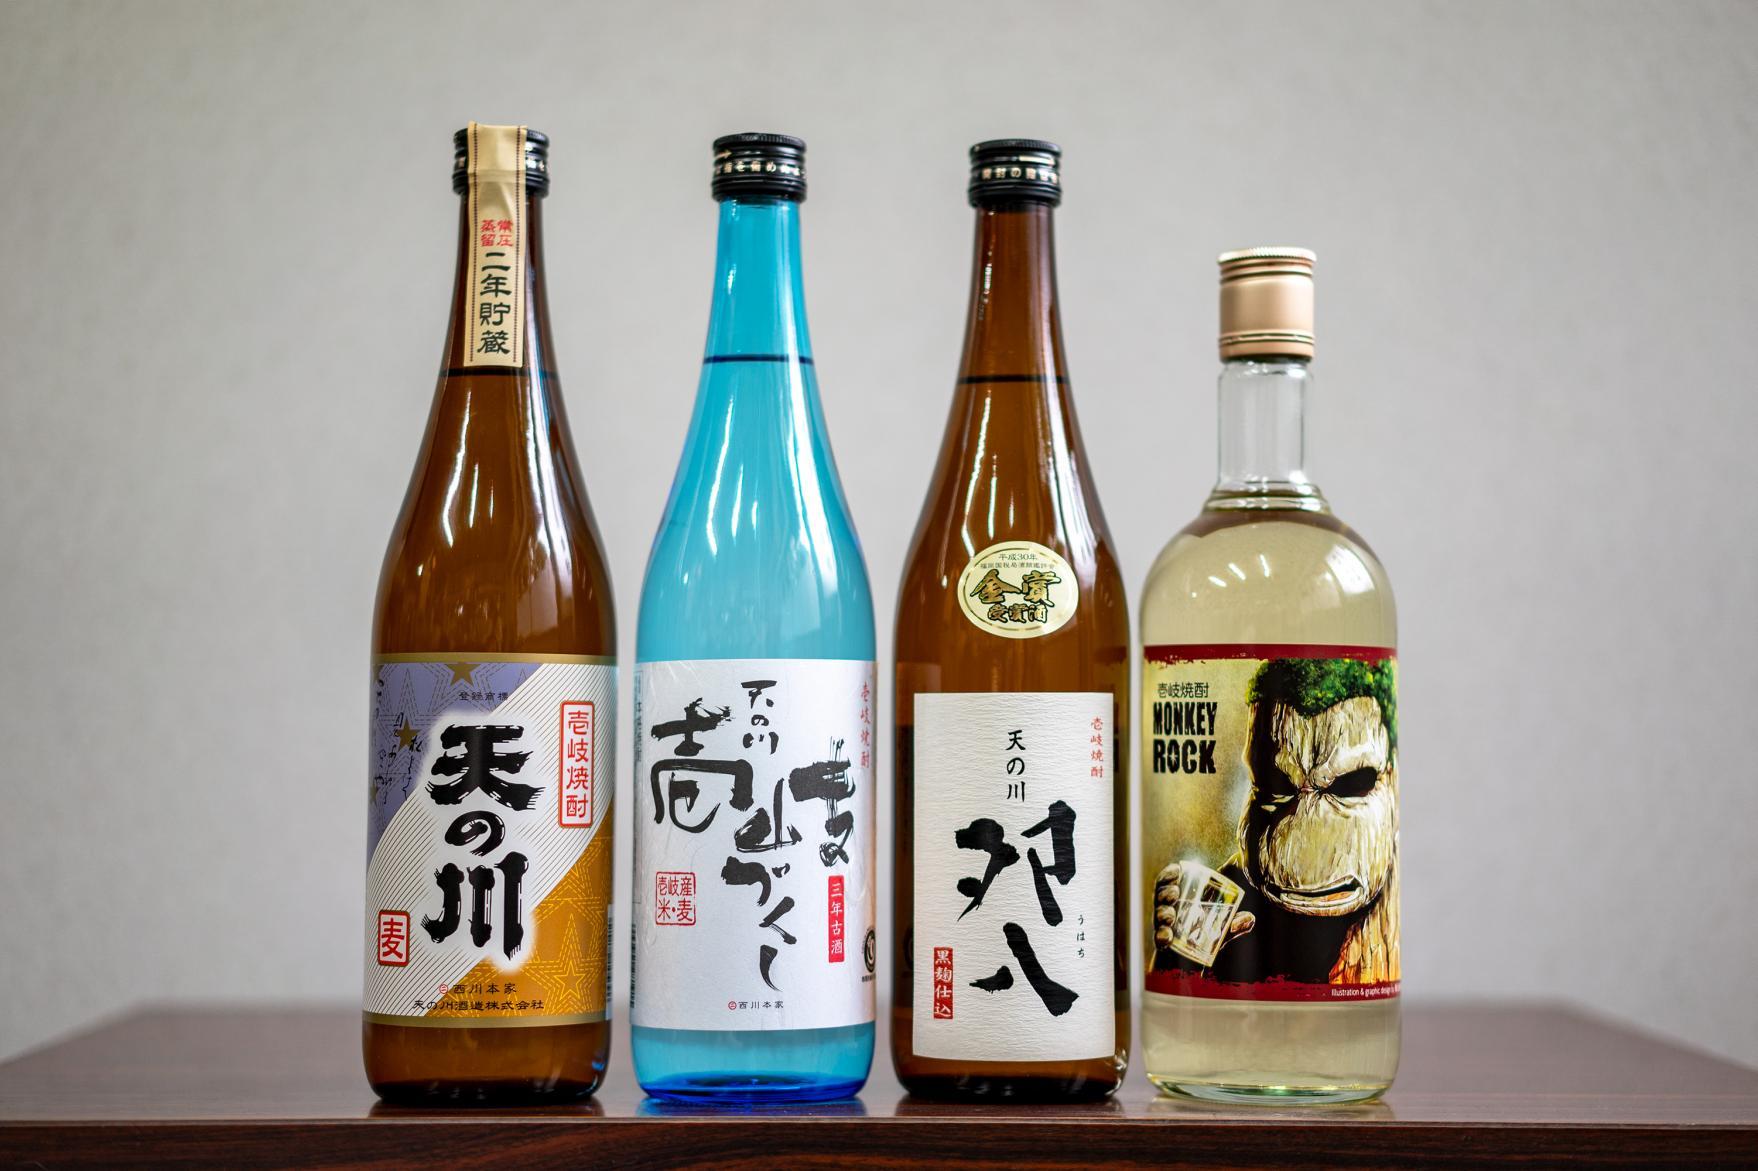 天の川酒造株式会社-2